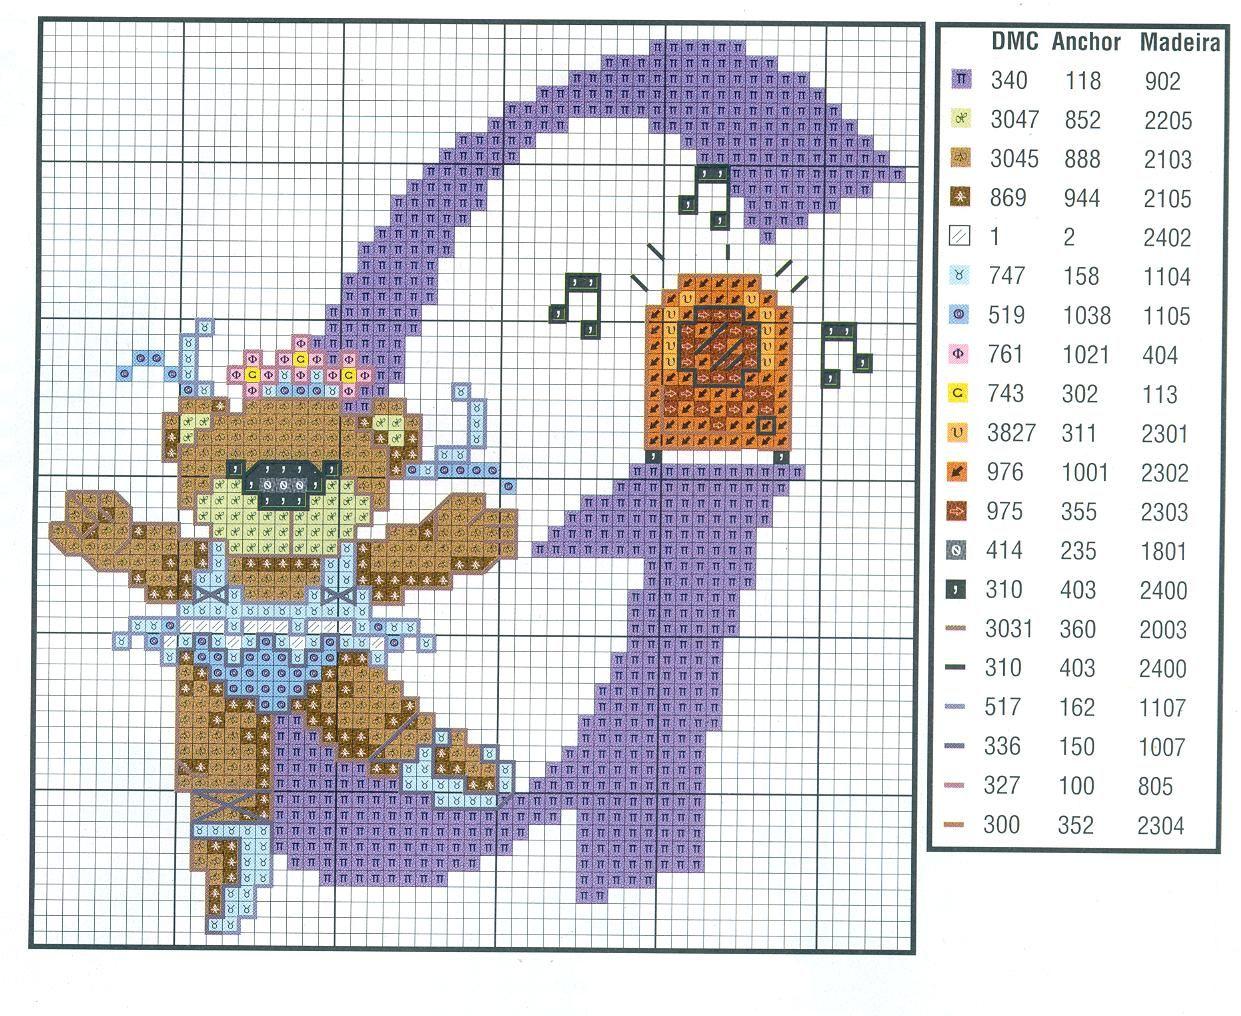 URSINHOS - BEAR - http://artebycachopapontocruz.blogspot.com.br/search?updated-max=2011-05-20T08:47:00-07:00&max-results=7&start=85&by-date=false